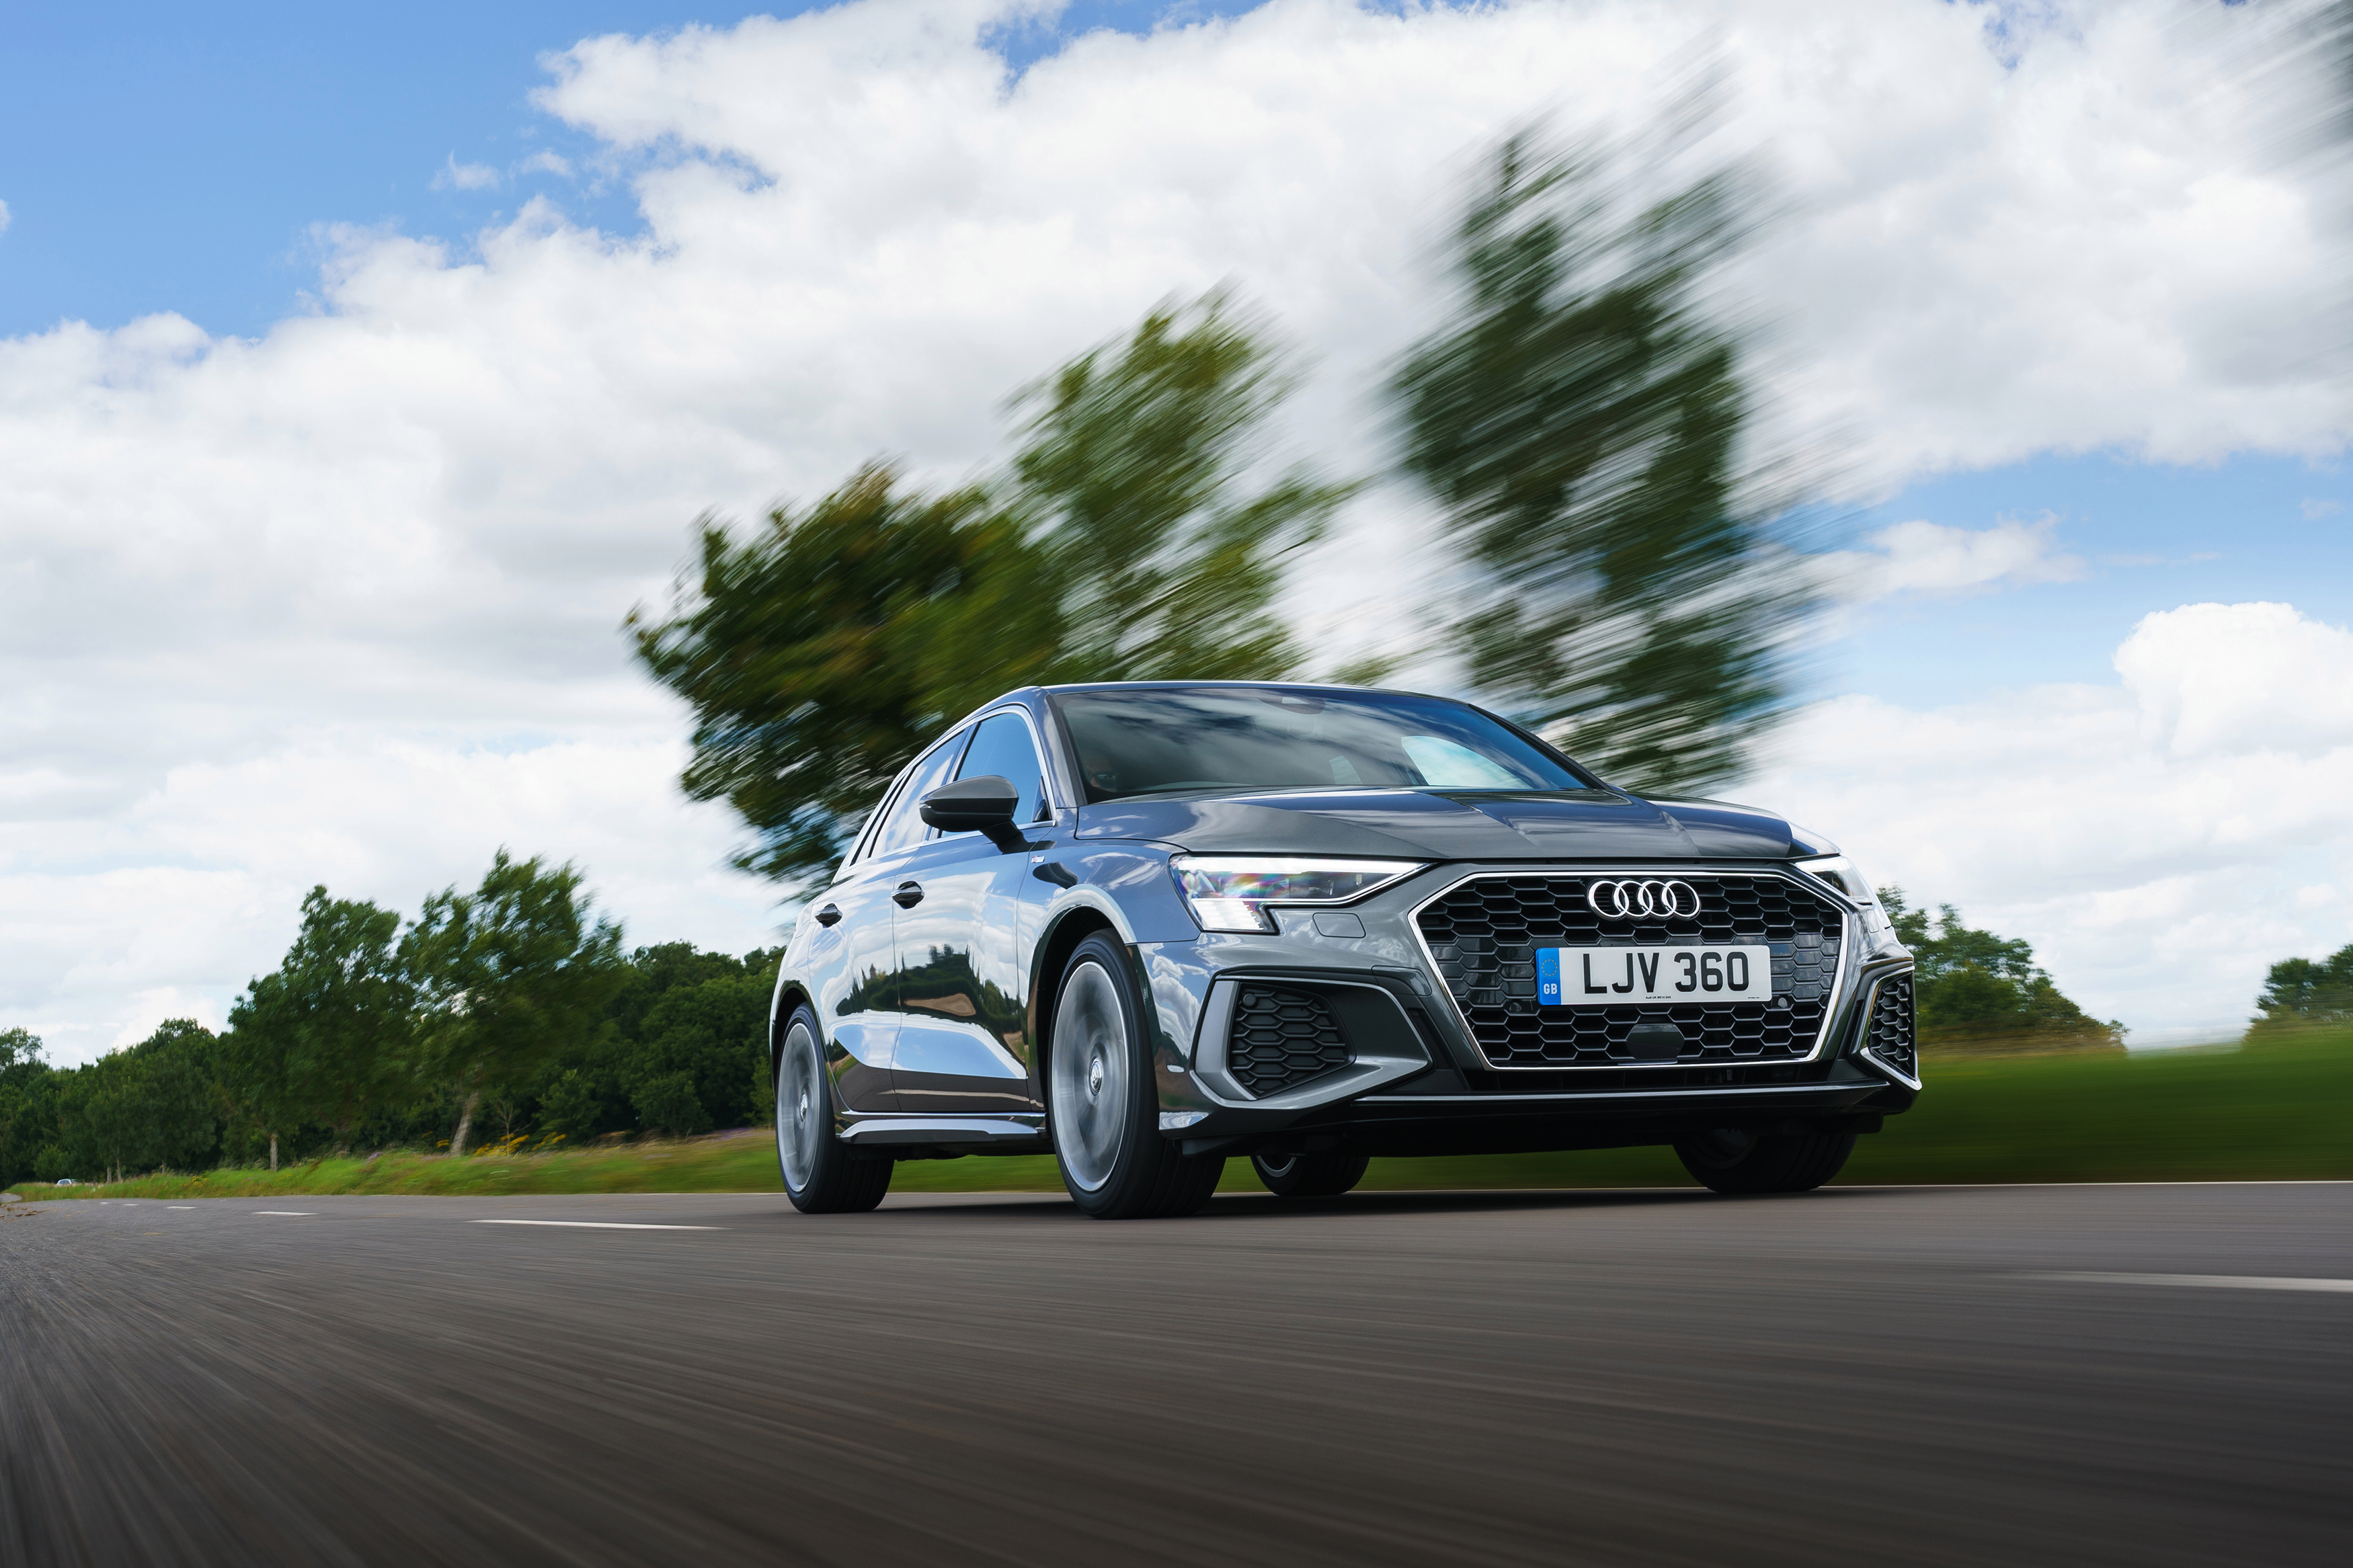 Audi A3's advanced tech and design trump BMW and Mercedes